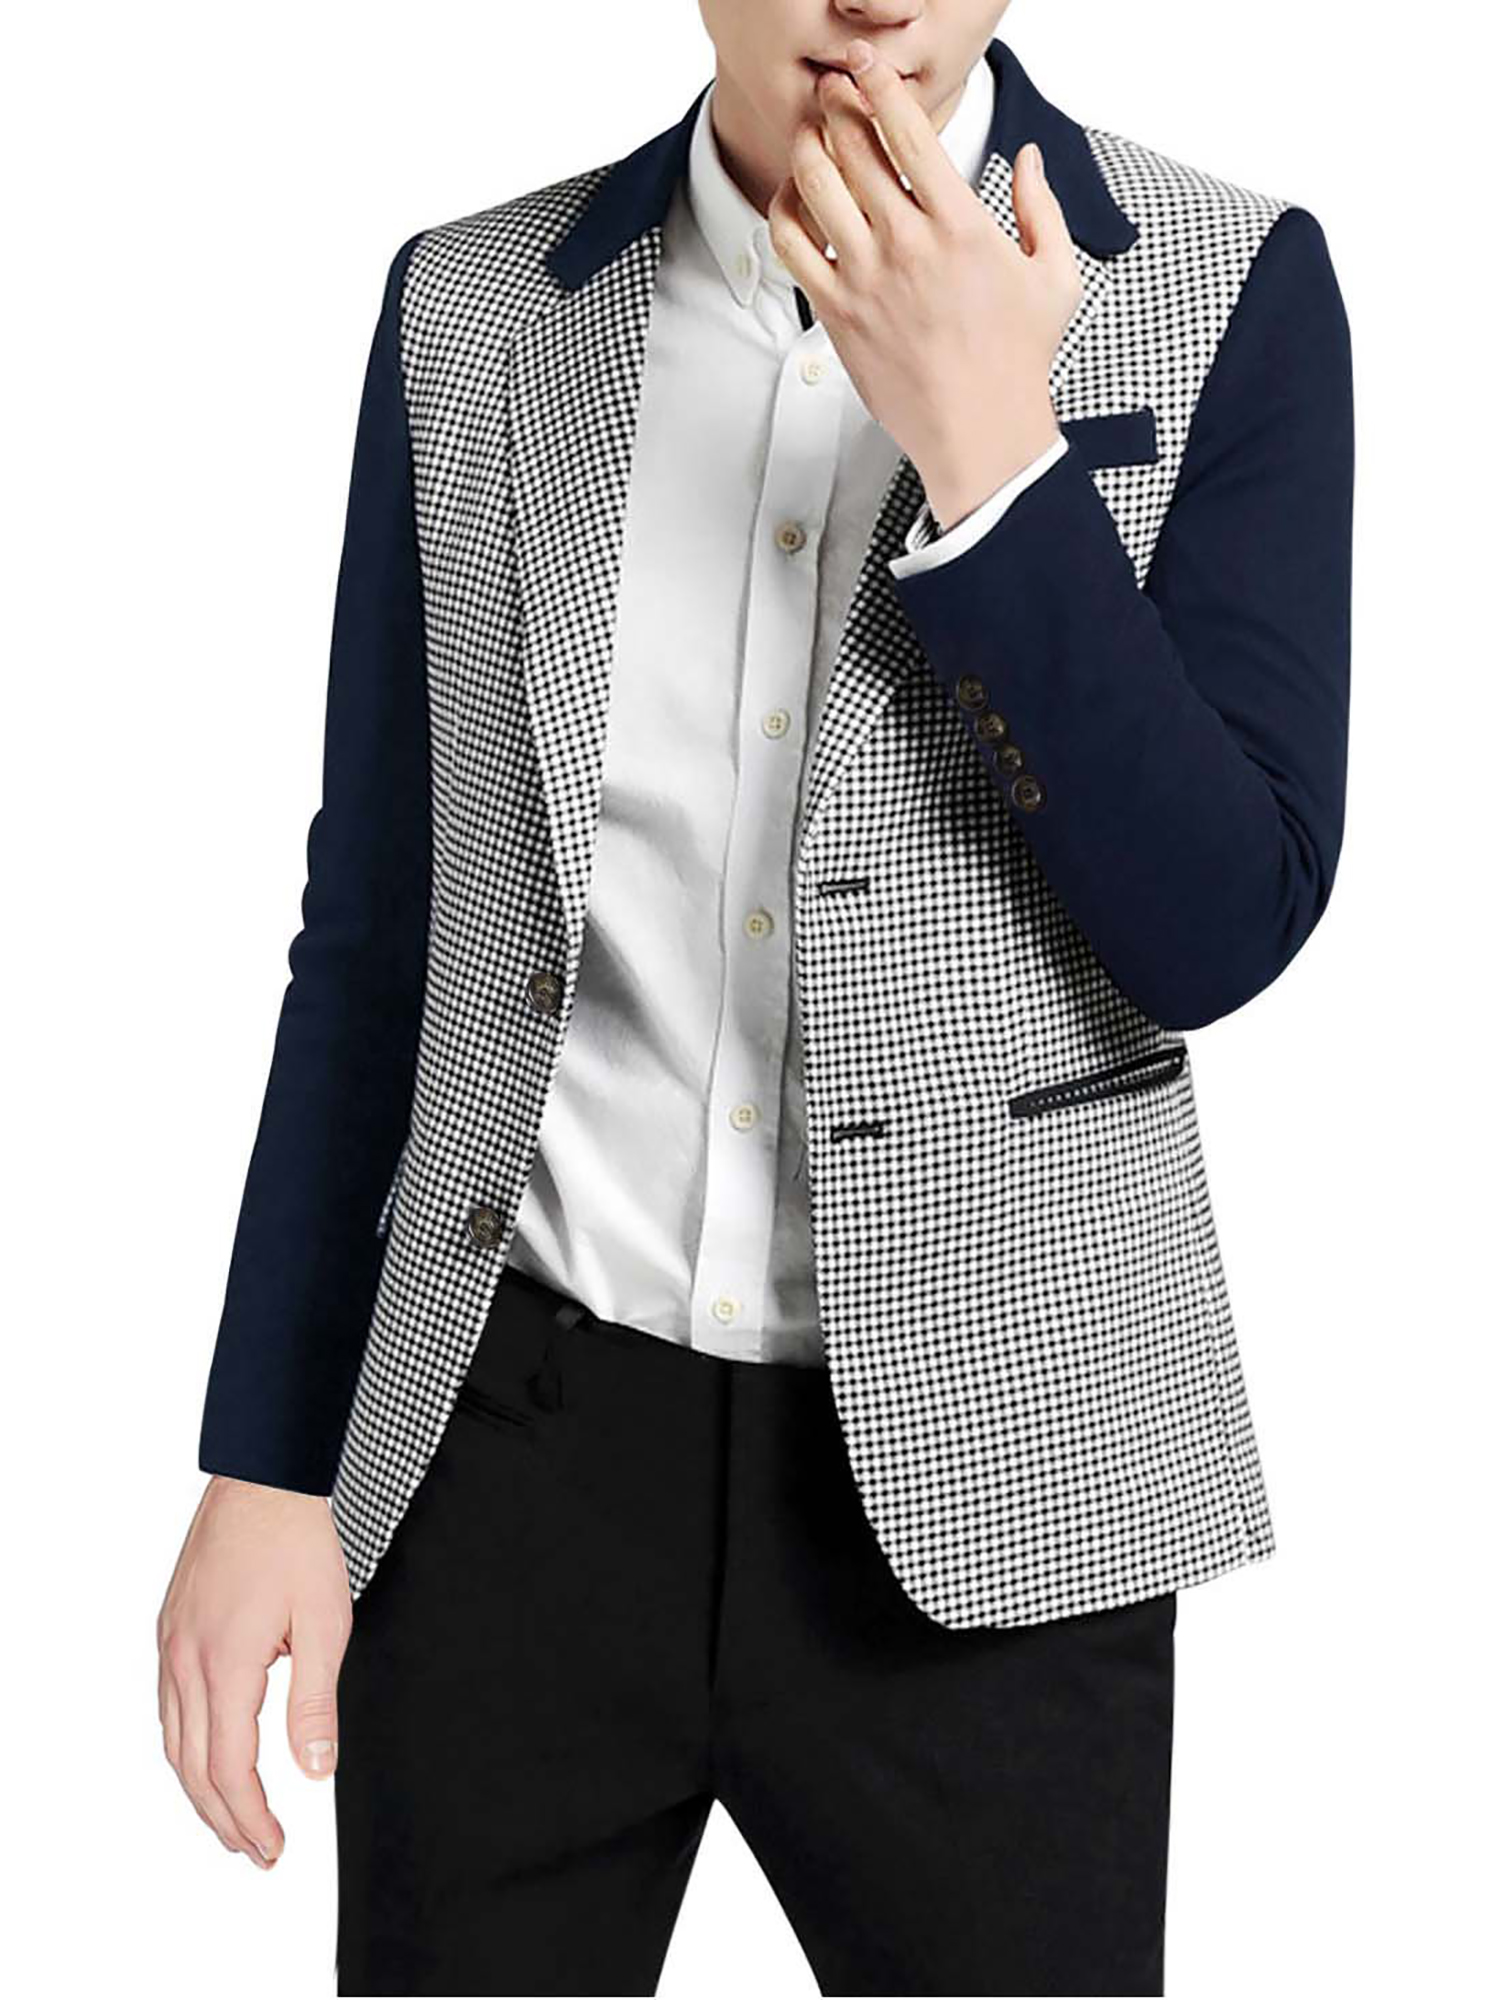 Azzuro Men's Swallow Gird Slit Side Casual Blazer Blue (Size S / 36)